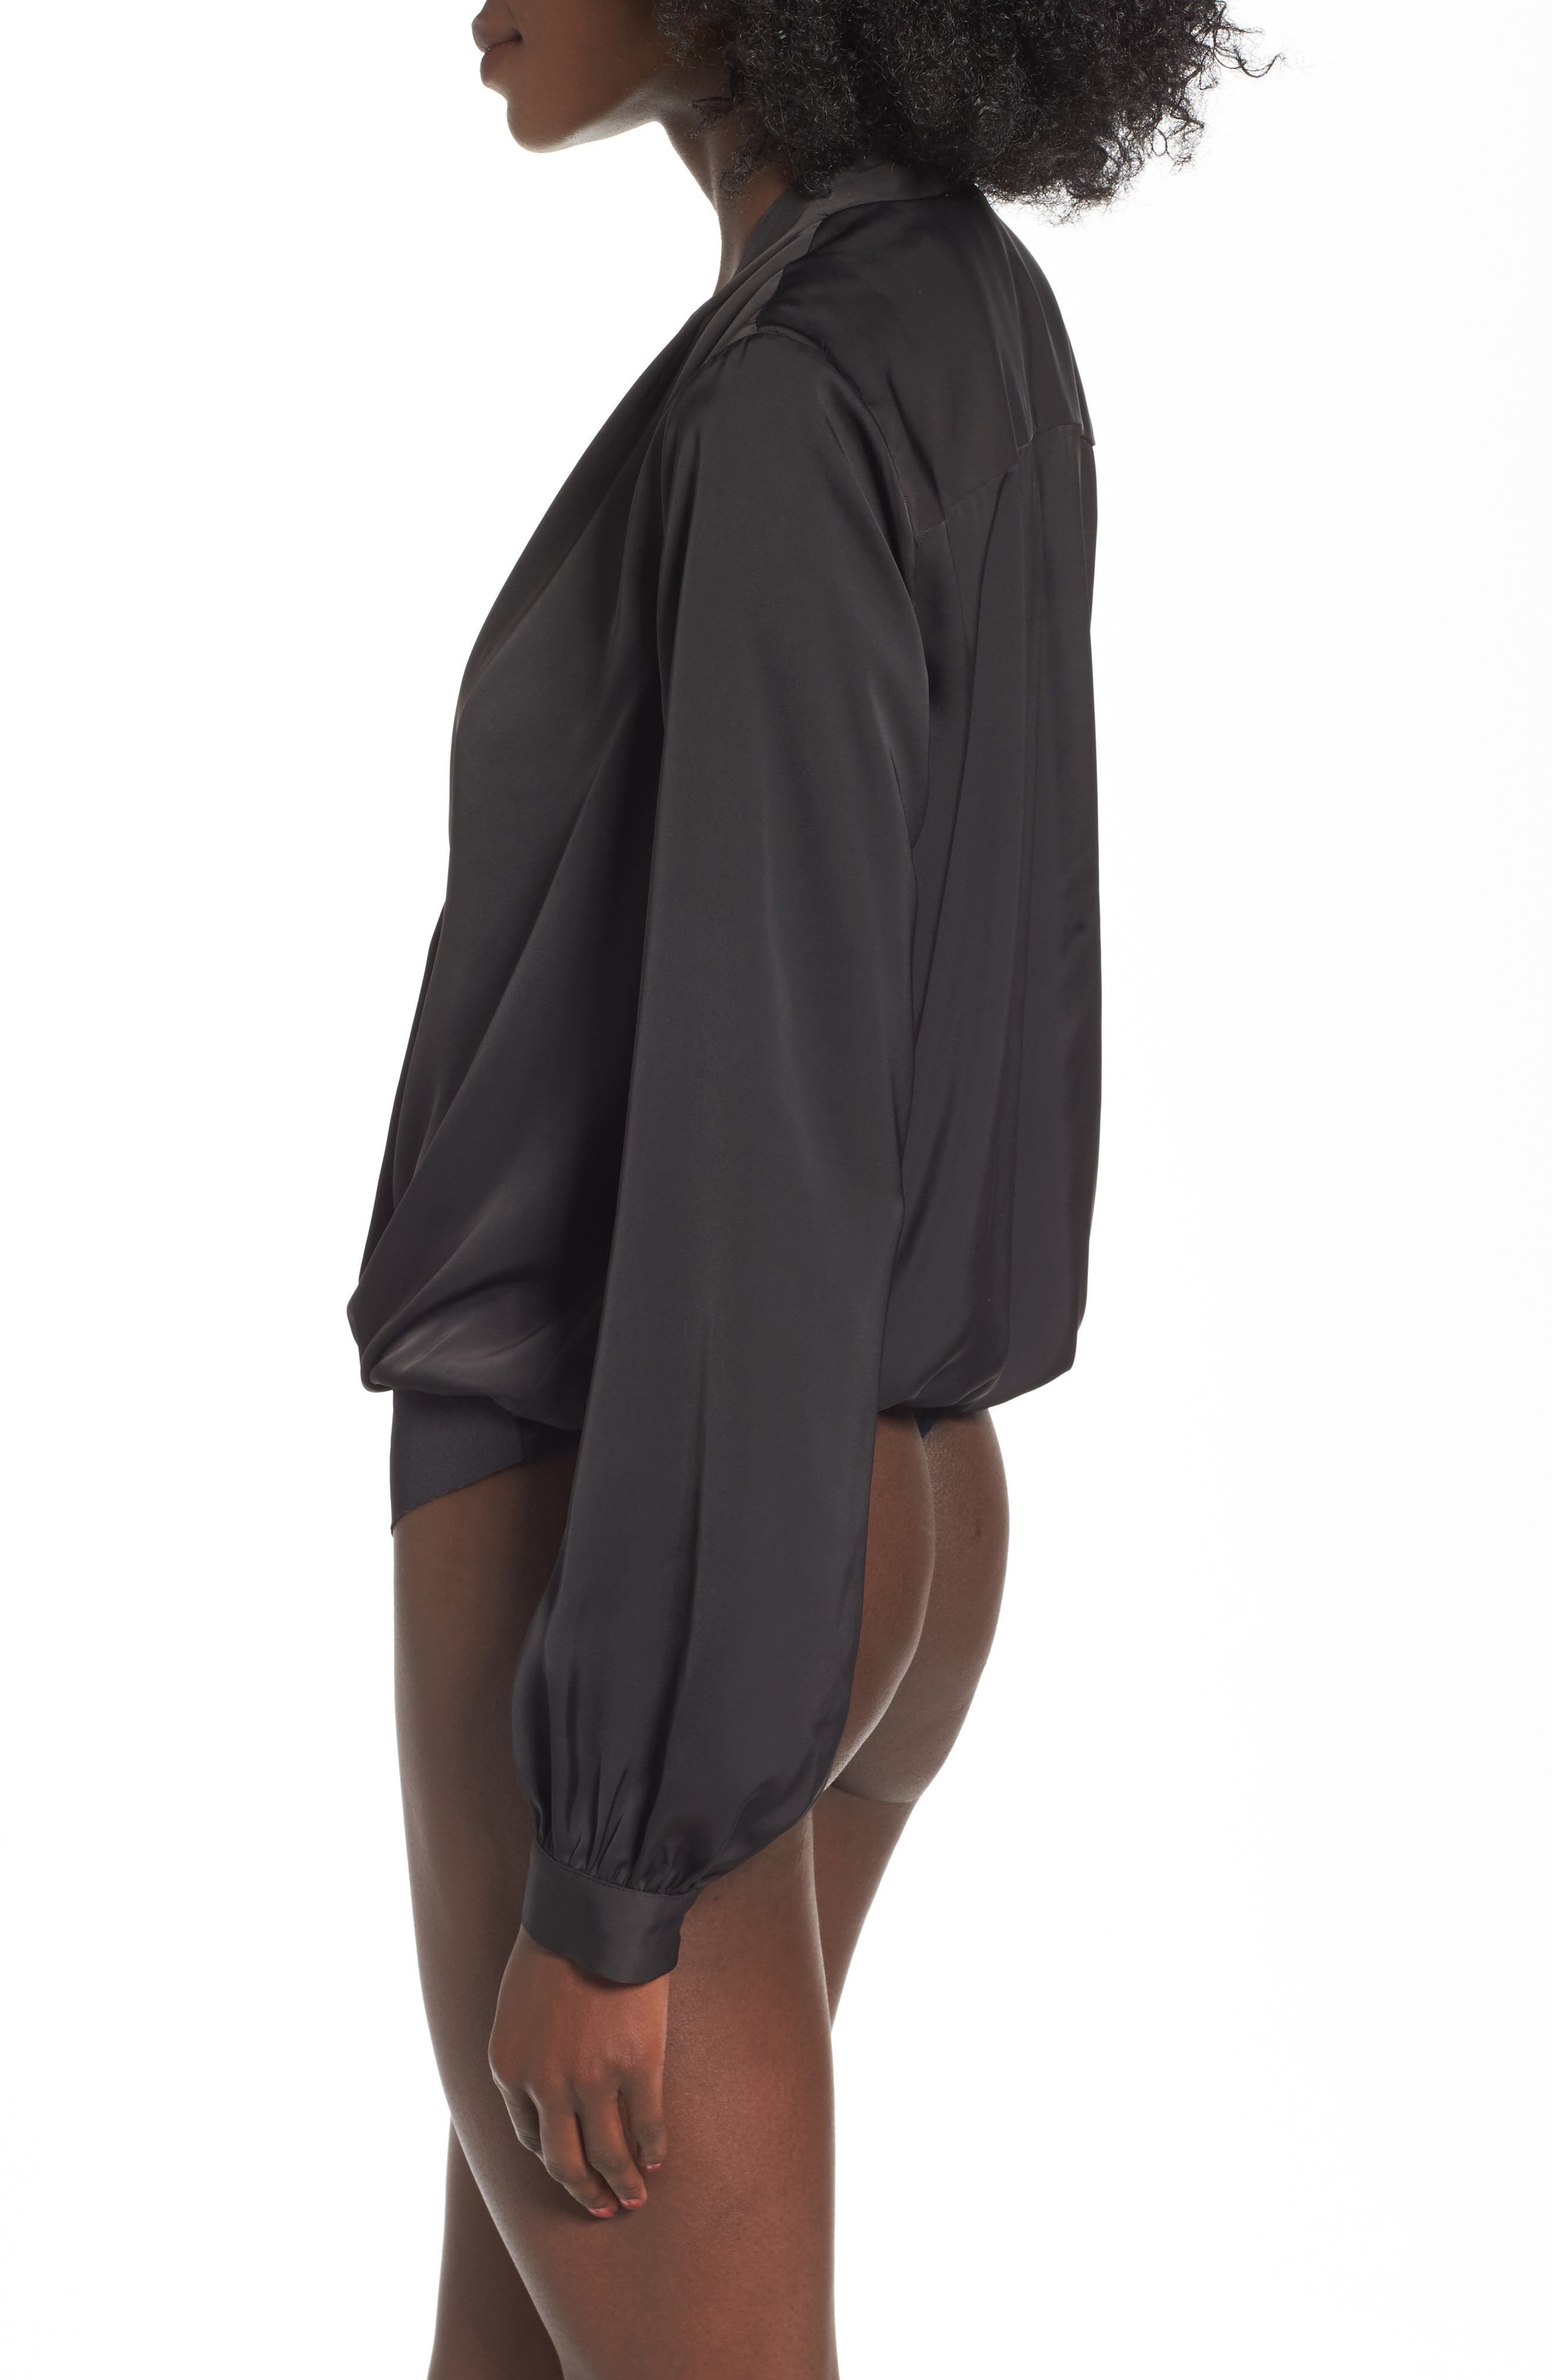 L'Academie The Long Sleeve Bodysuit,                             Alternate thumbnail 2, color,                             Black